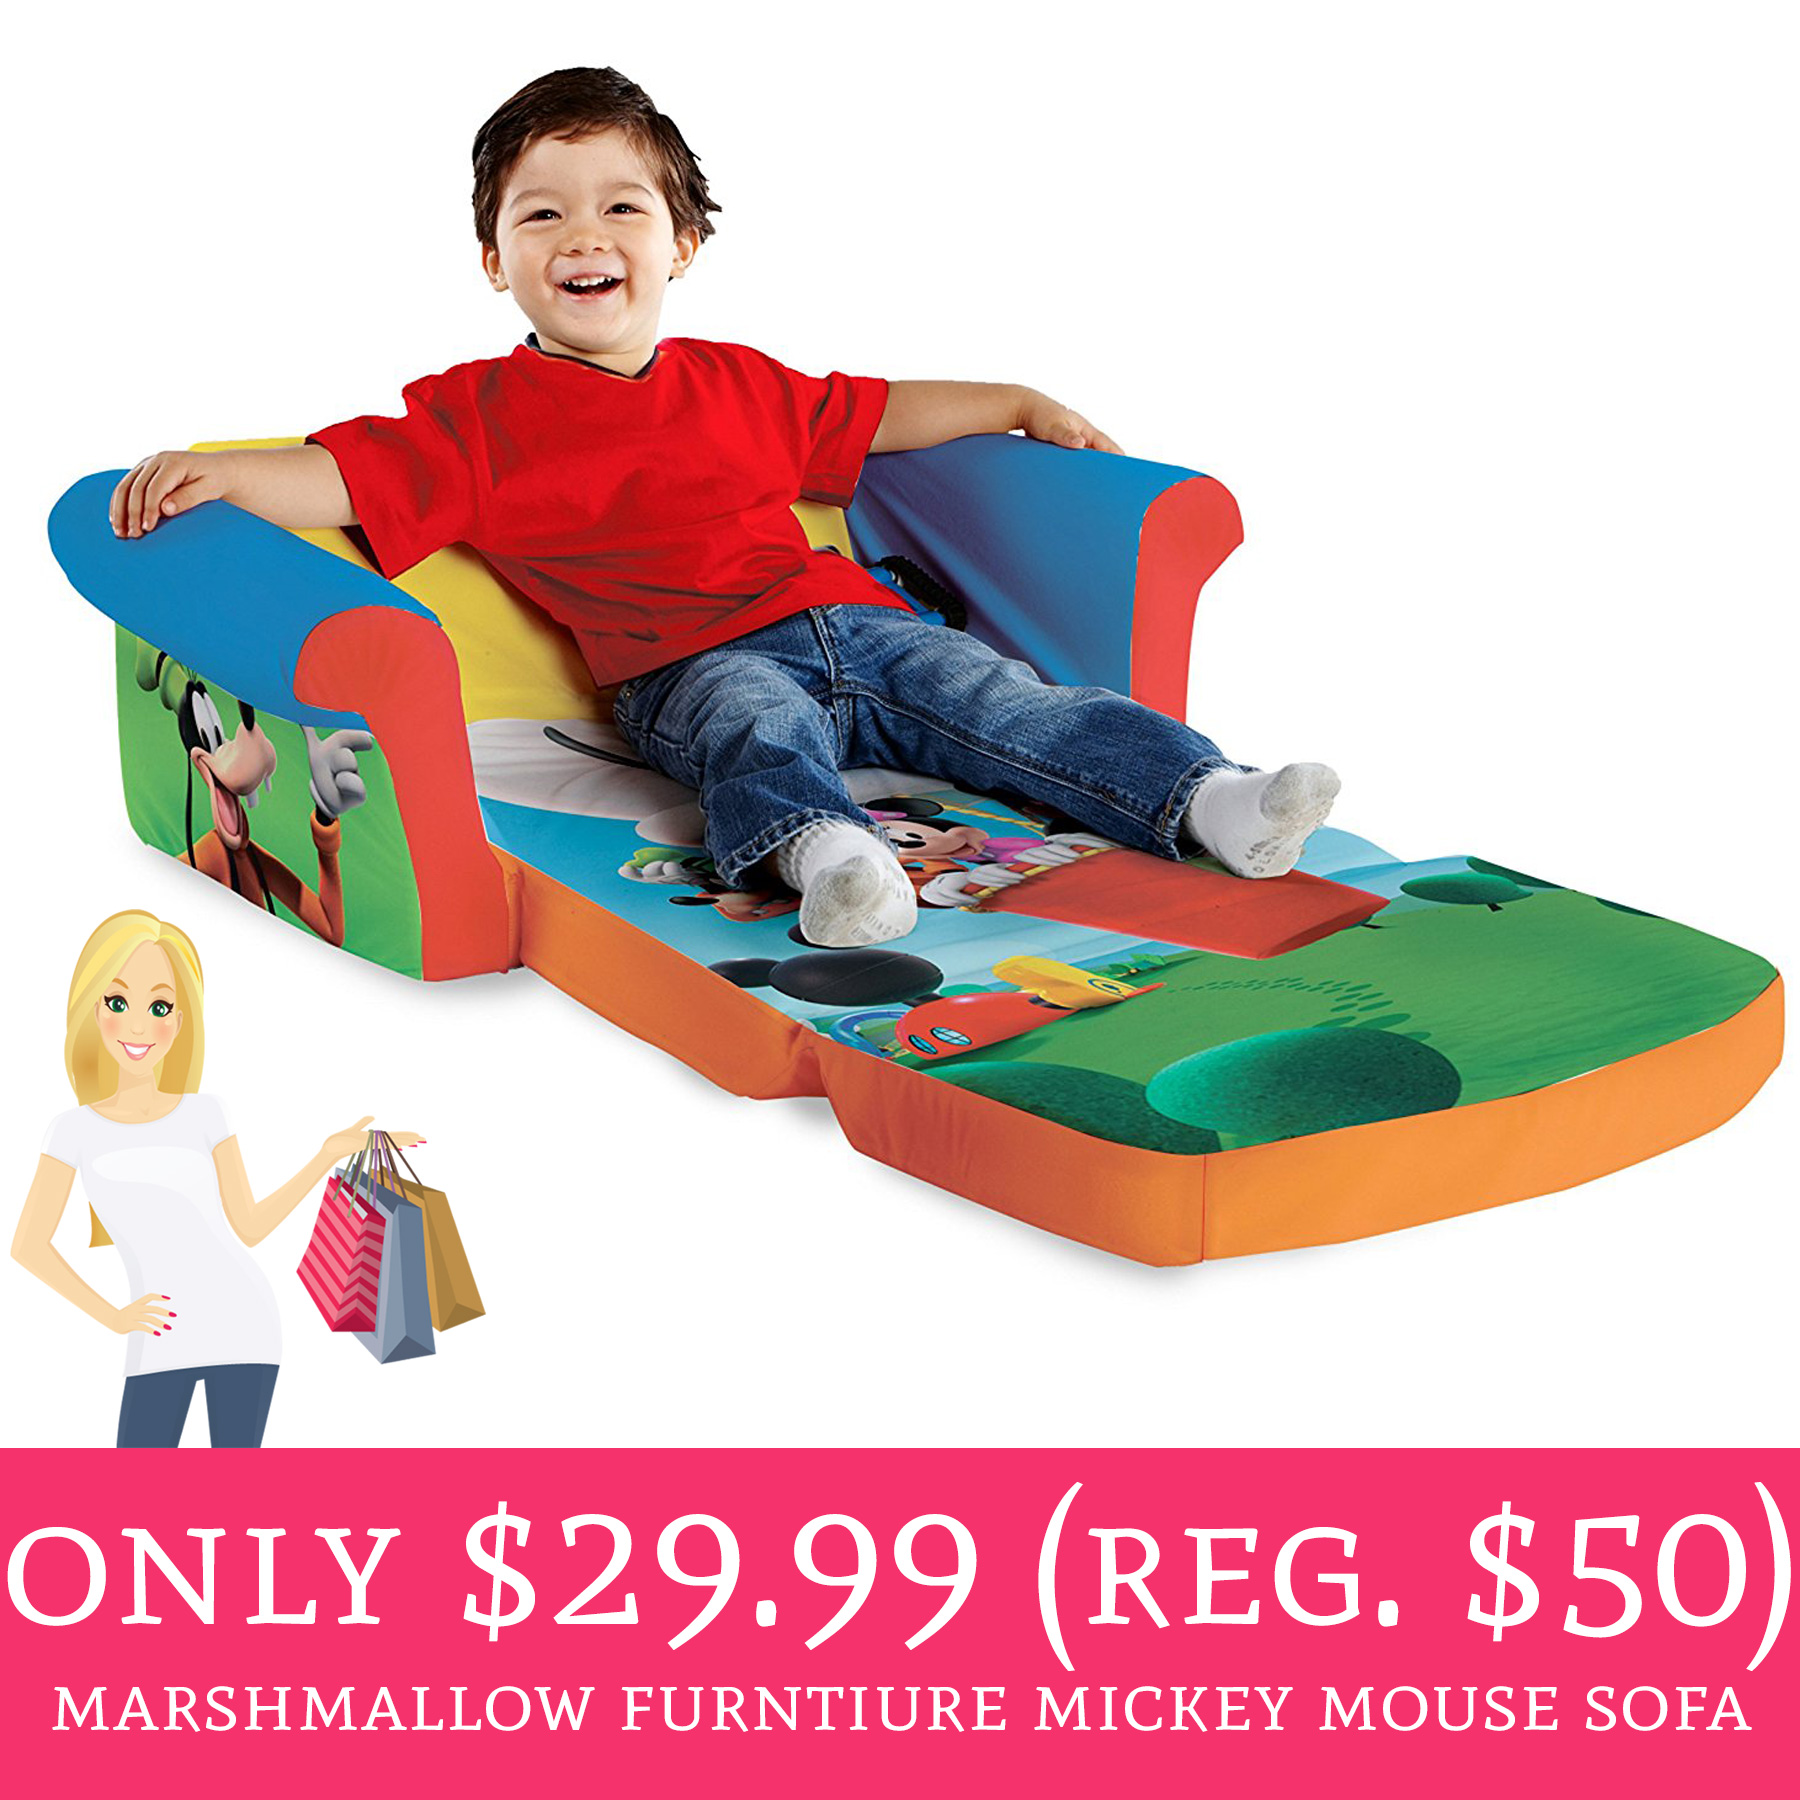 RARE Sale On Marshmallow Furniture!!